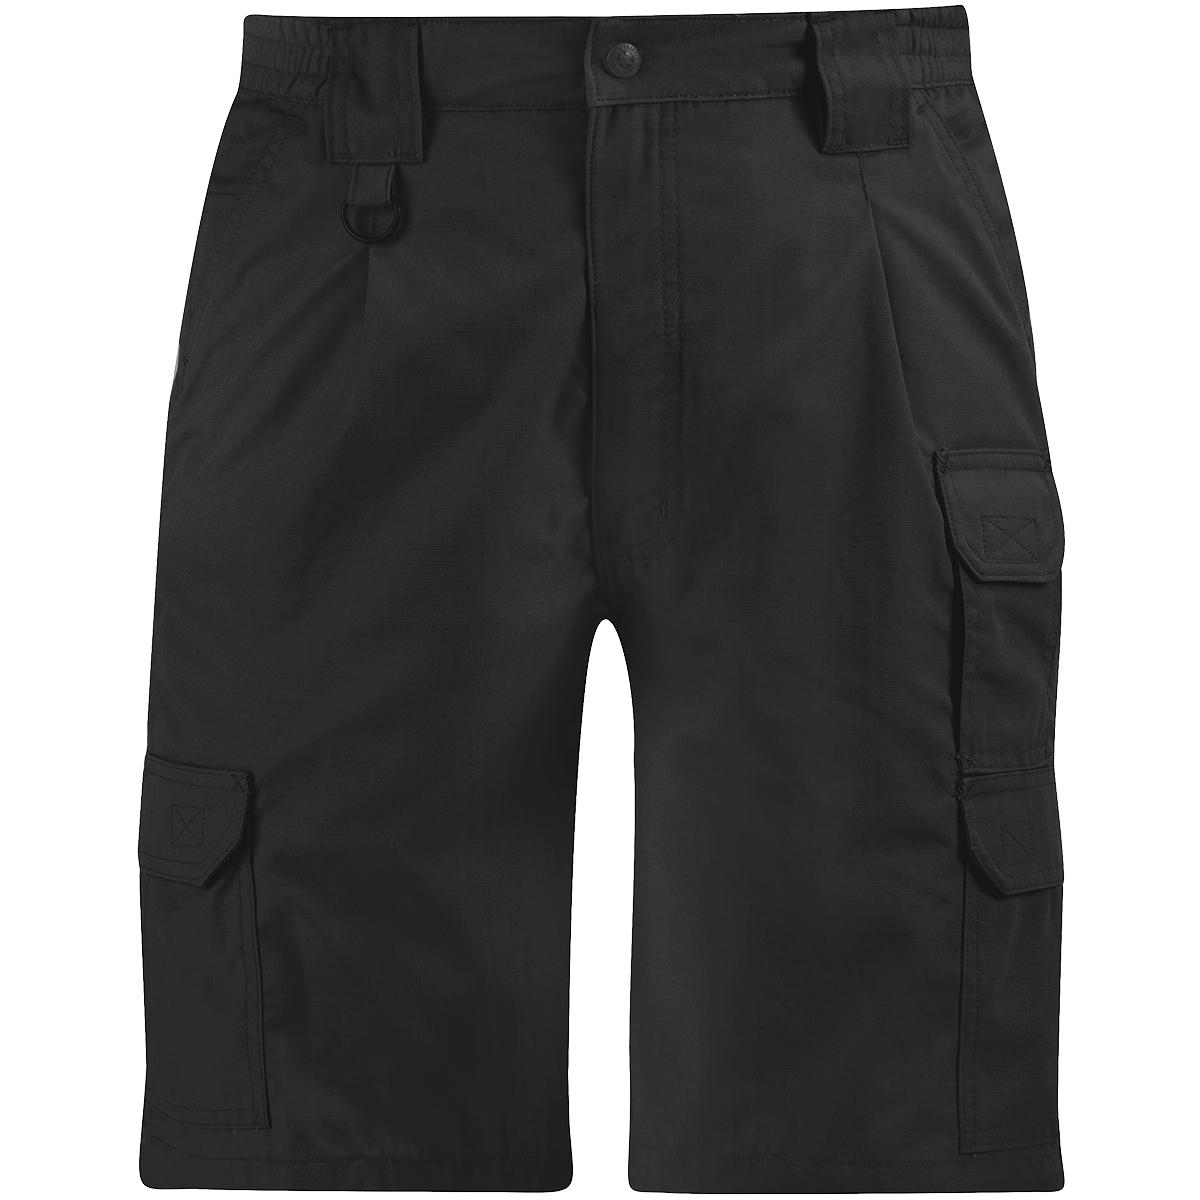 Propper Men's Tactical Shorts Black | Shorts | Military 1st